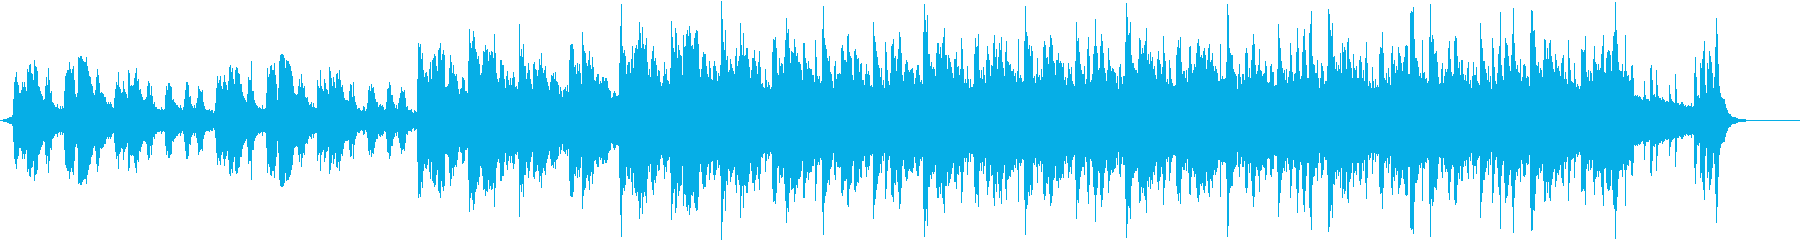 StringsとHerpの幻想的なBGMの再生済みの波形